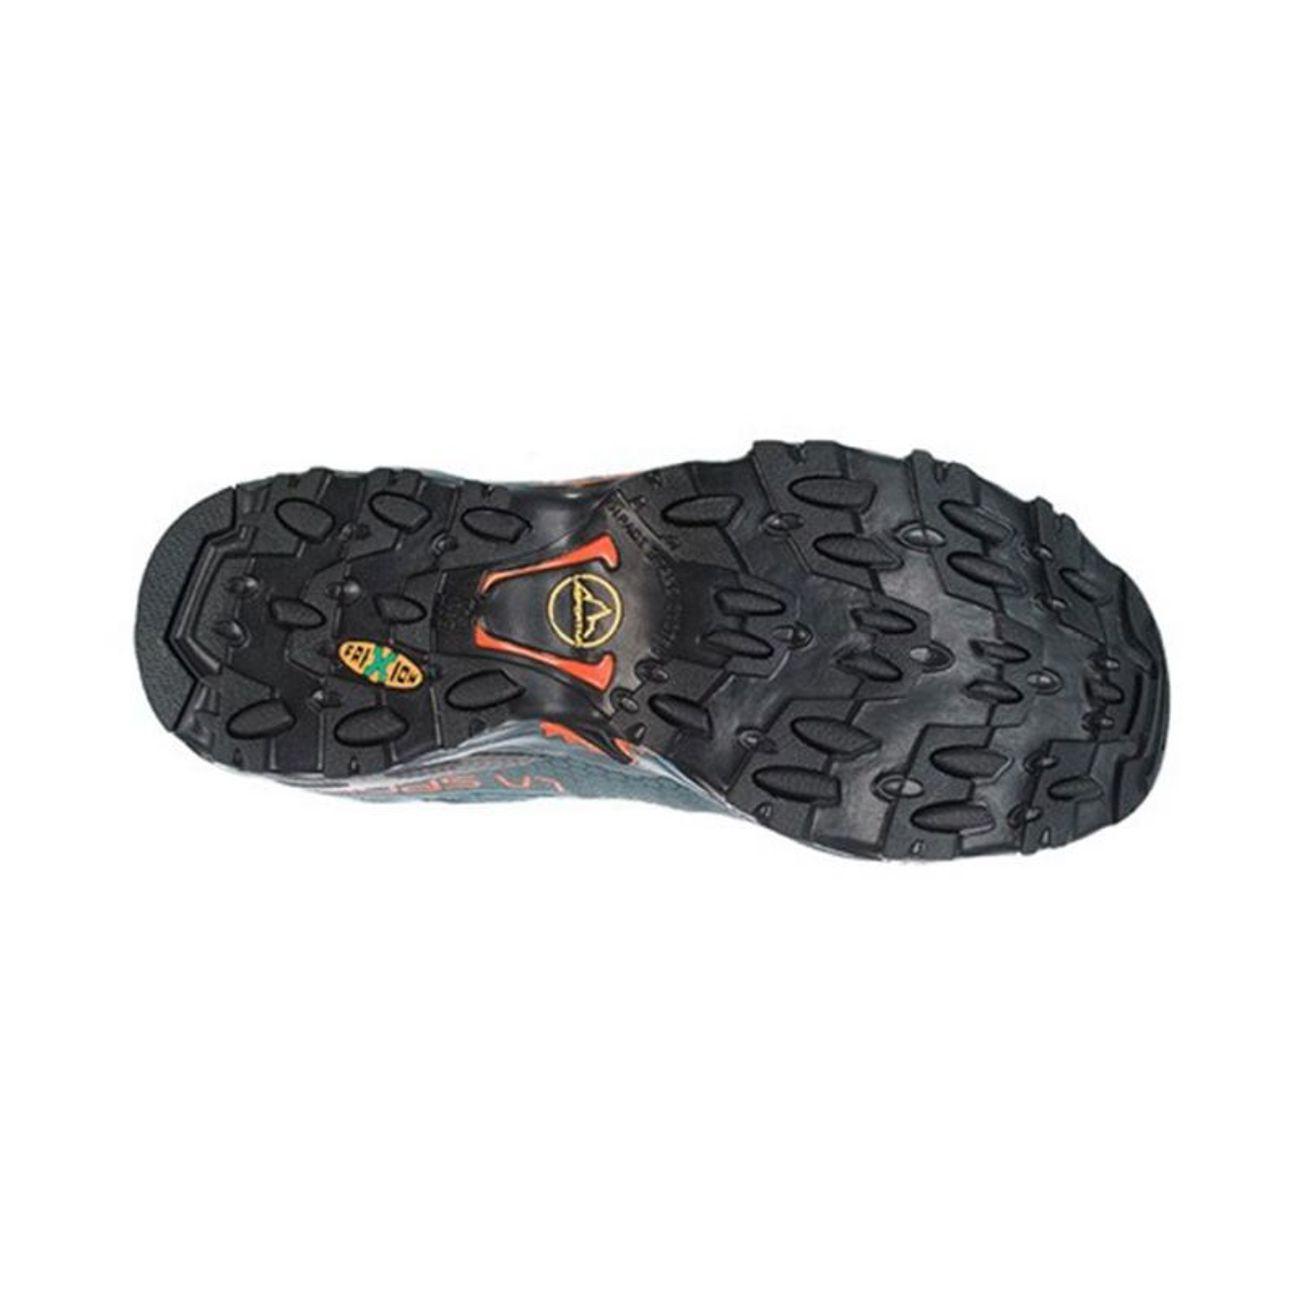 Chaussures Raptor Homme Trail La Ultra Gtx Bleu Sportiva Gris 53A4RqjL